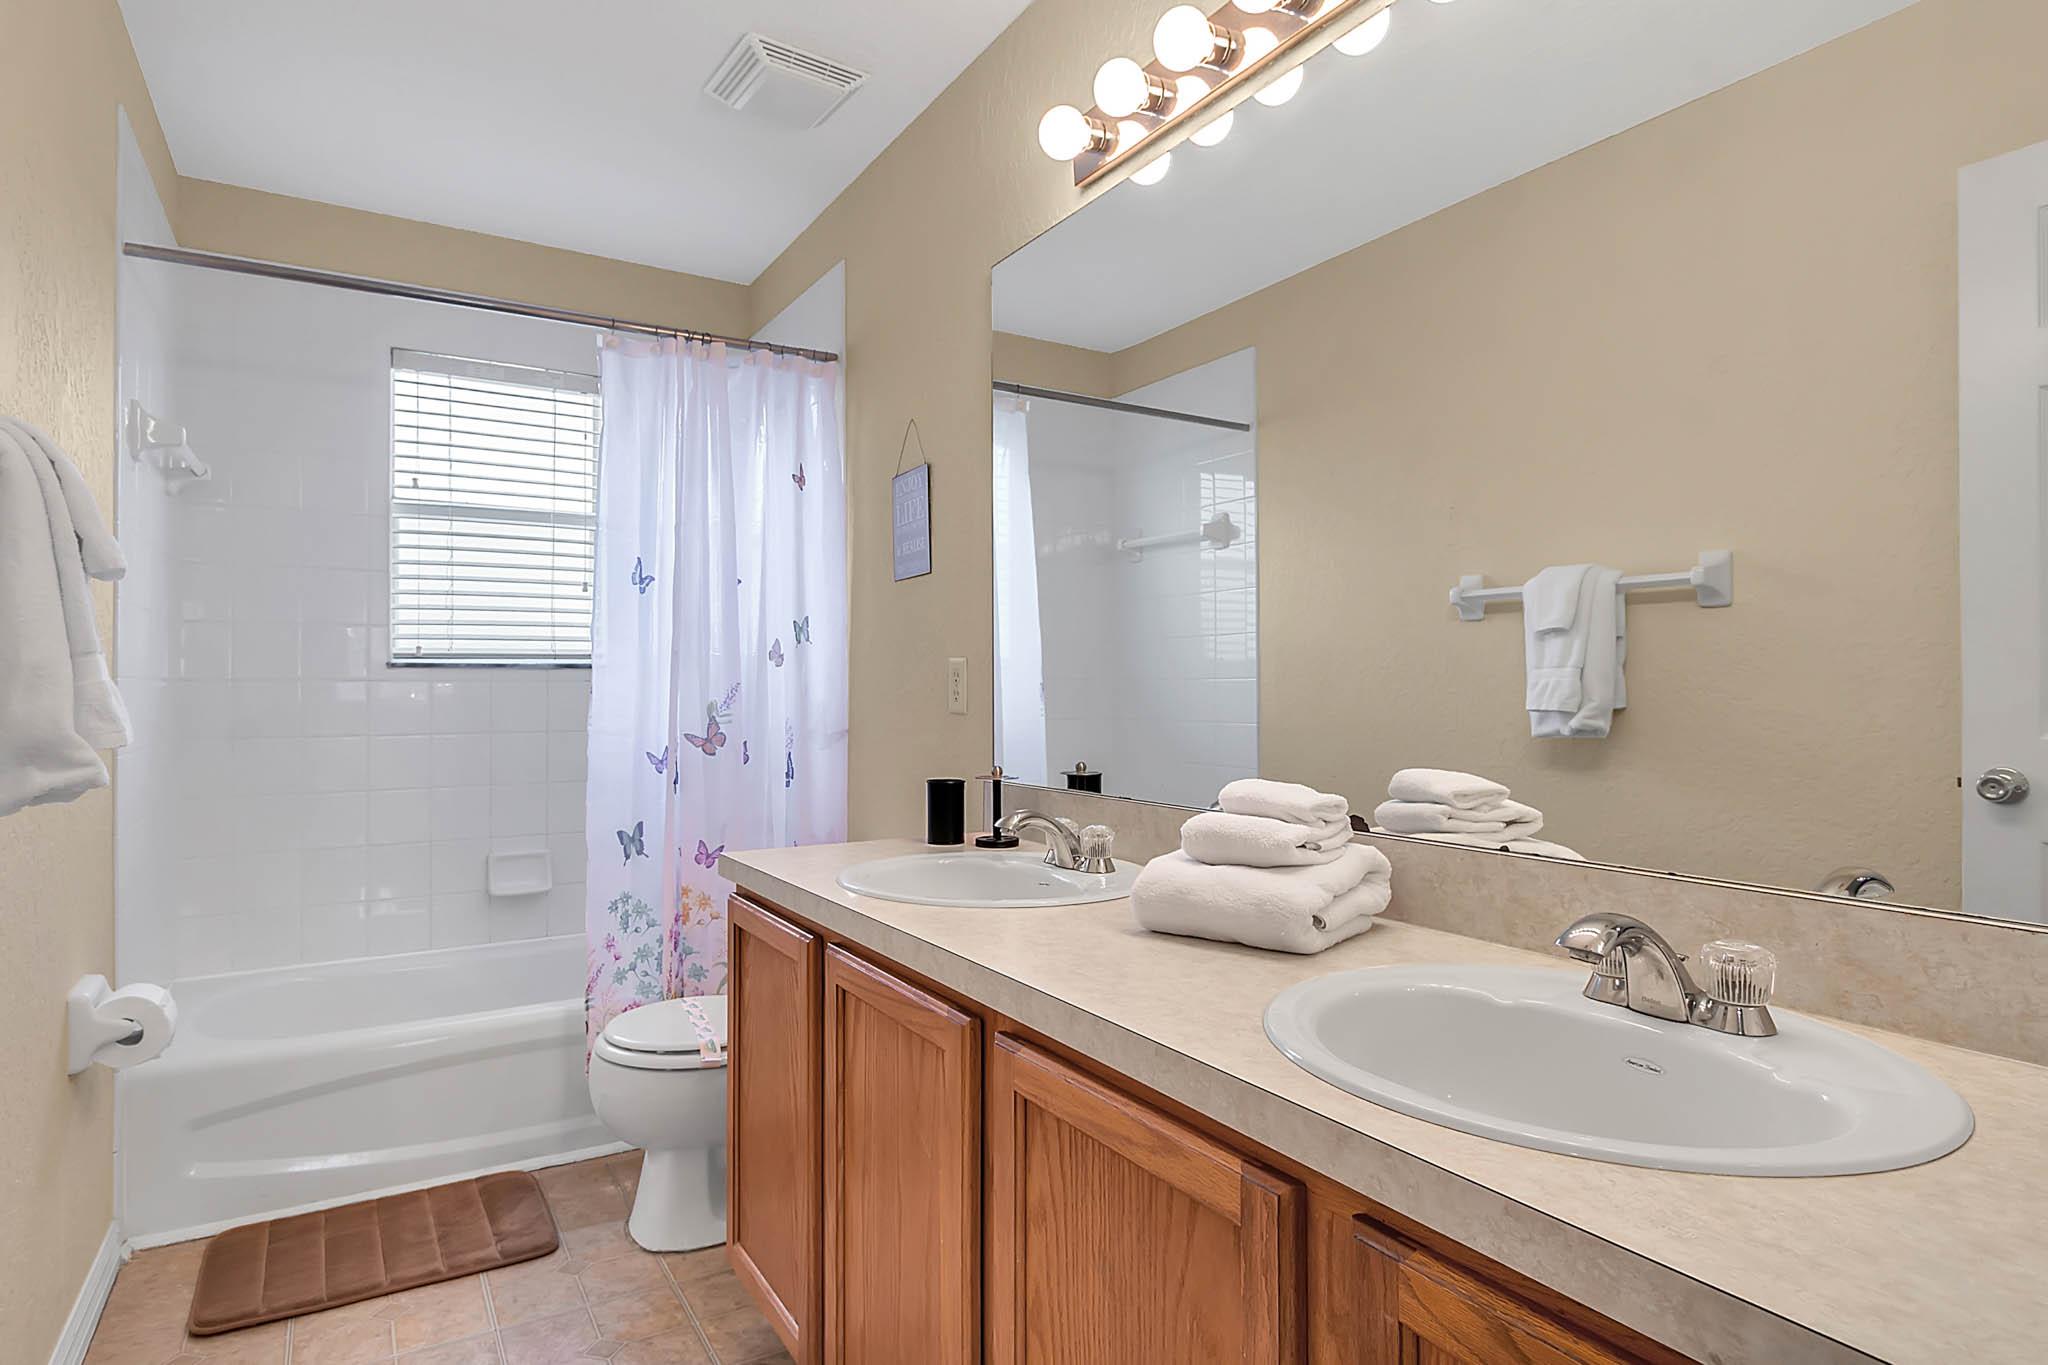 229-N-Hampton-Dr--Davenport--FL-33897----25---Bathroom.jpg